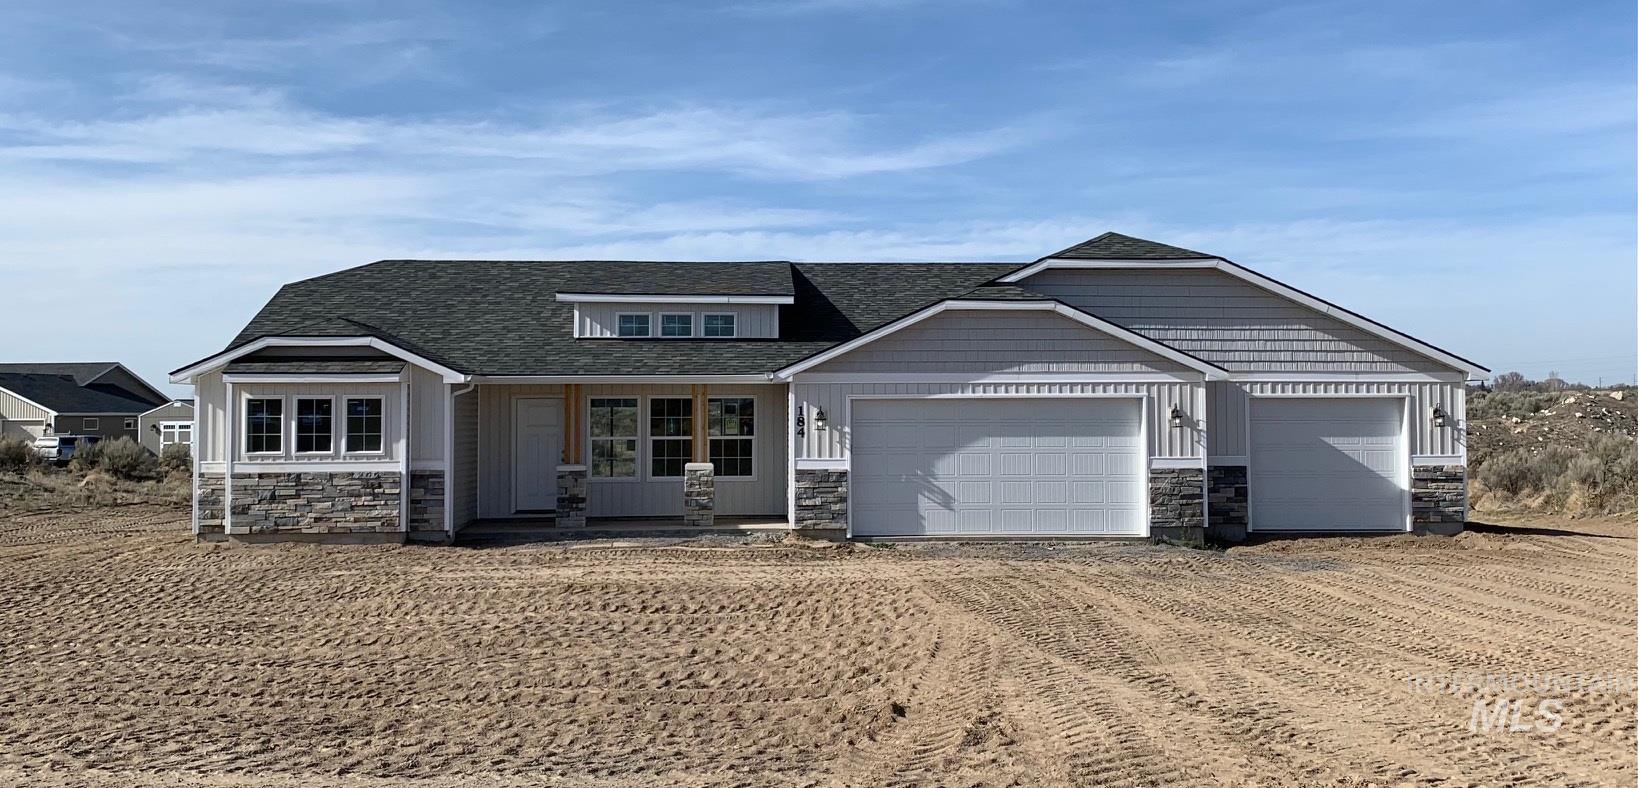 184 Mesilla Property Photo - Jerome, ID real estate listing